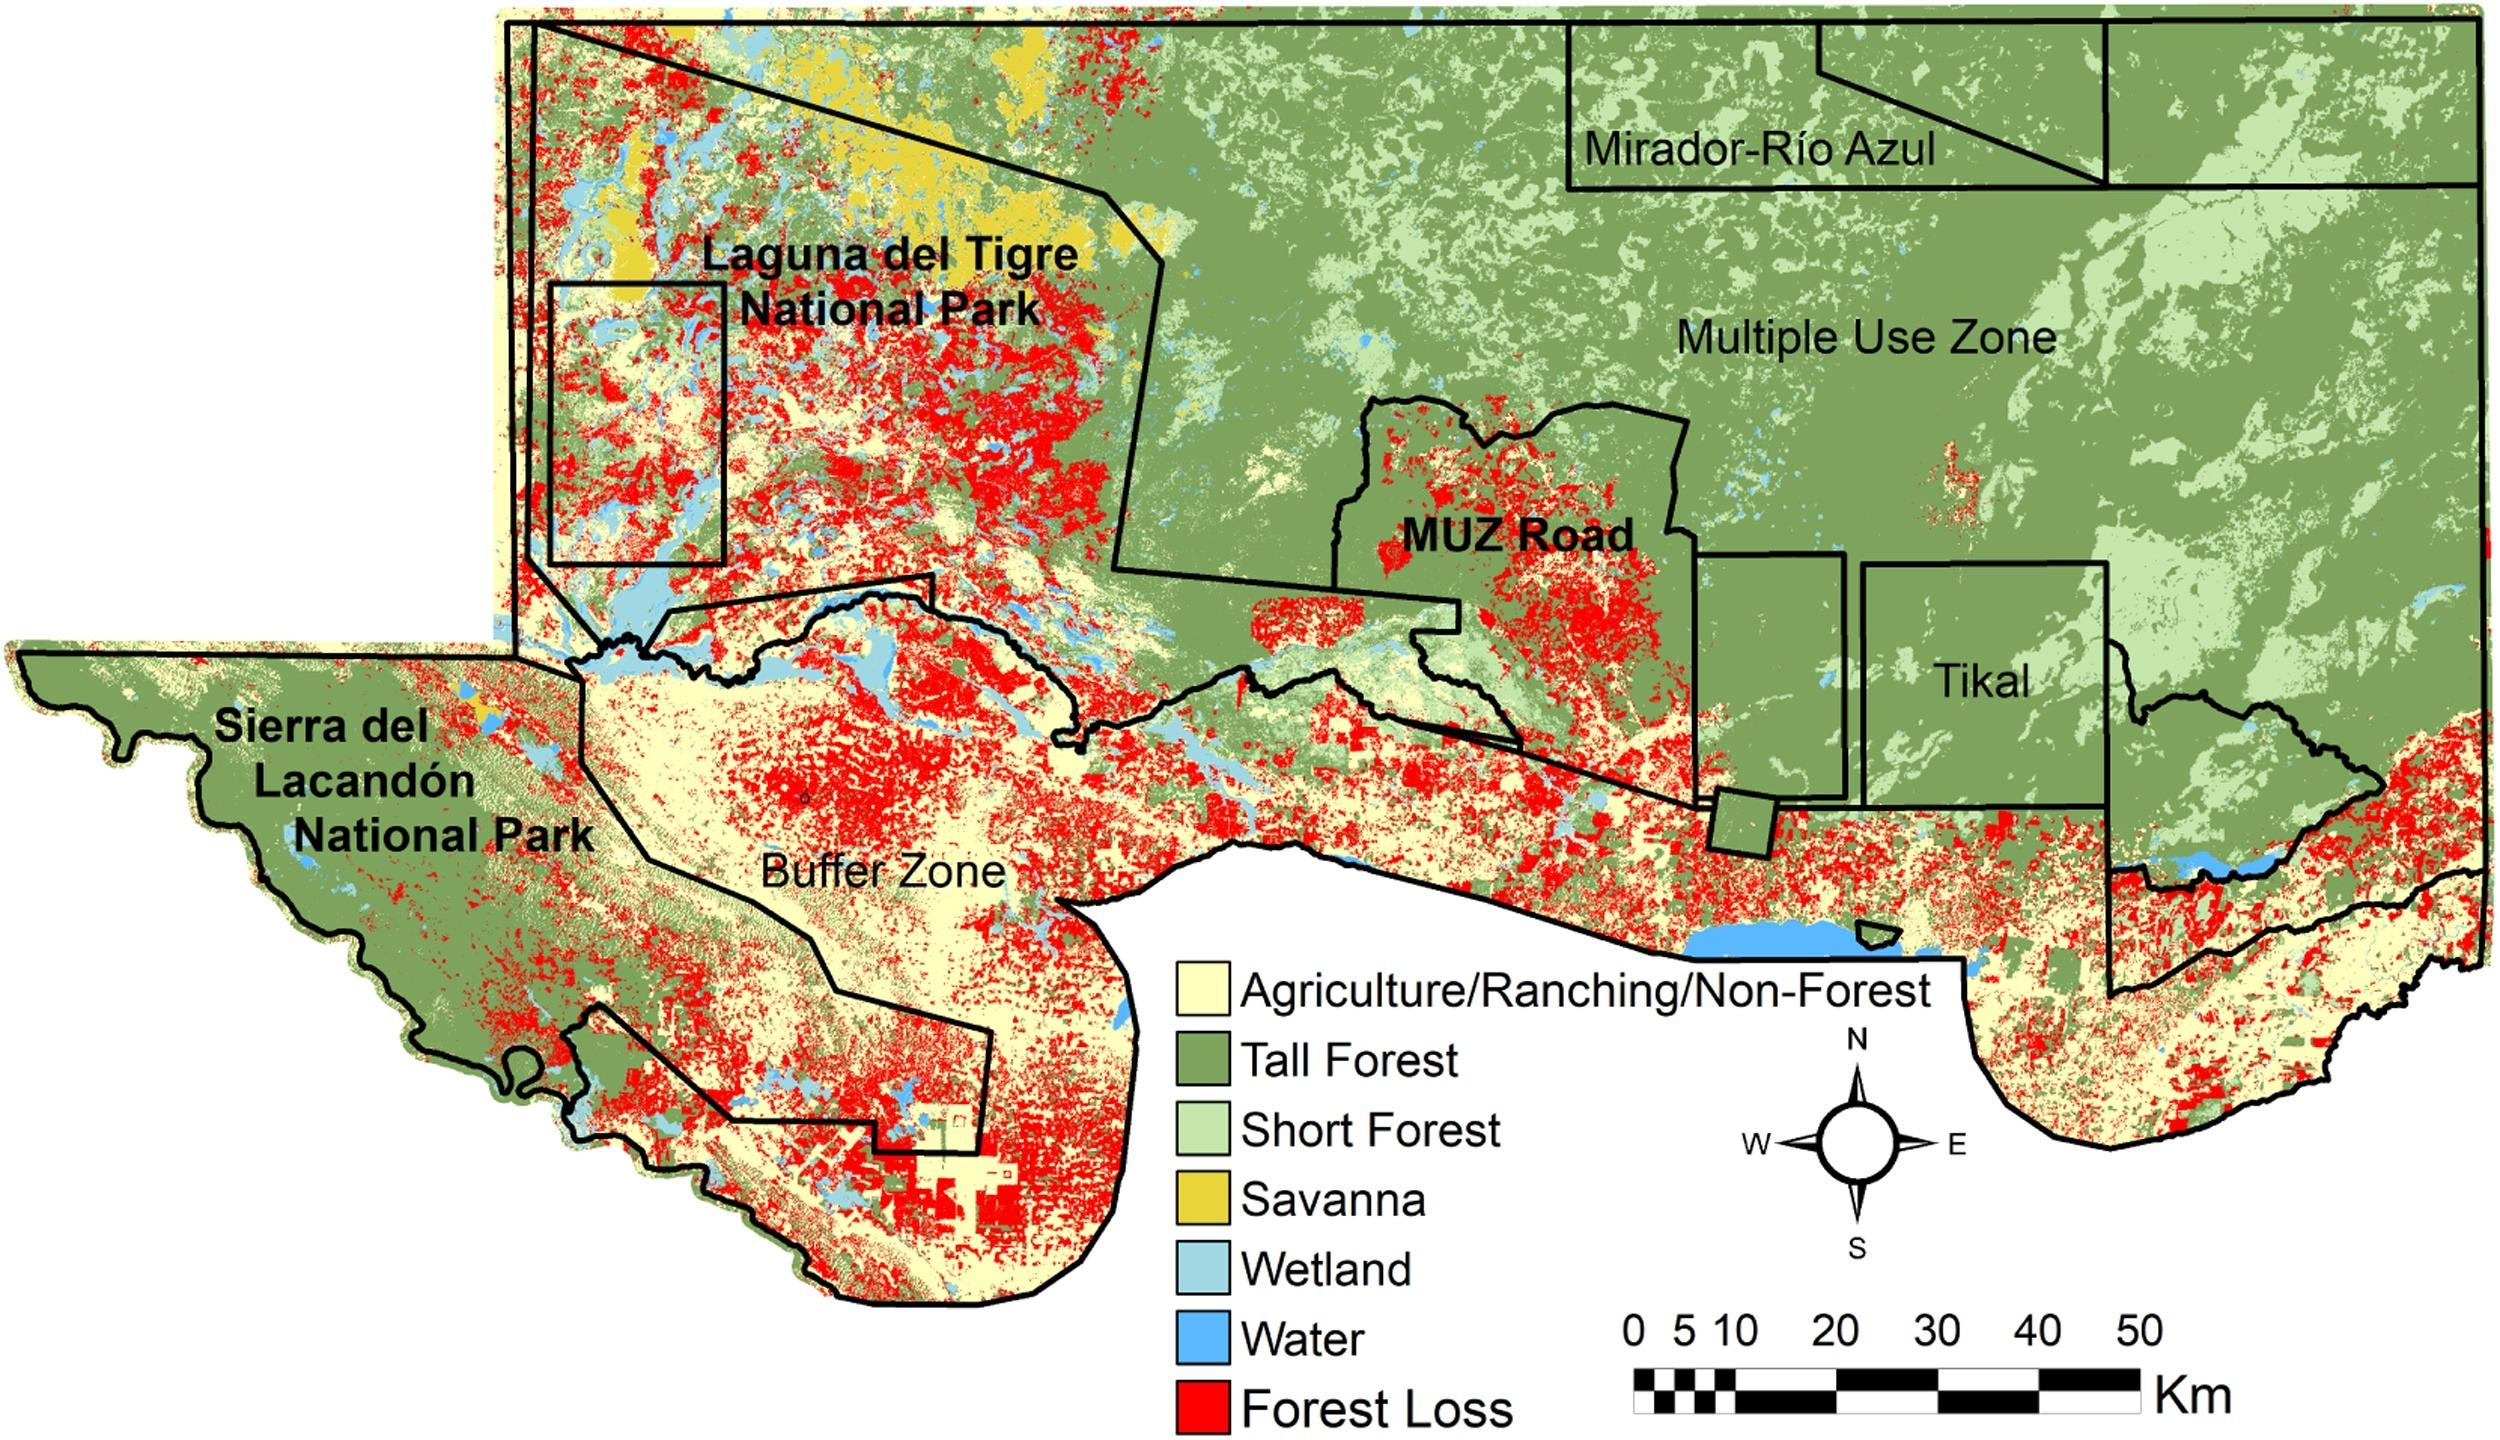 Reserva de la Biósfera Maya